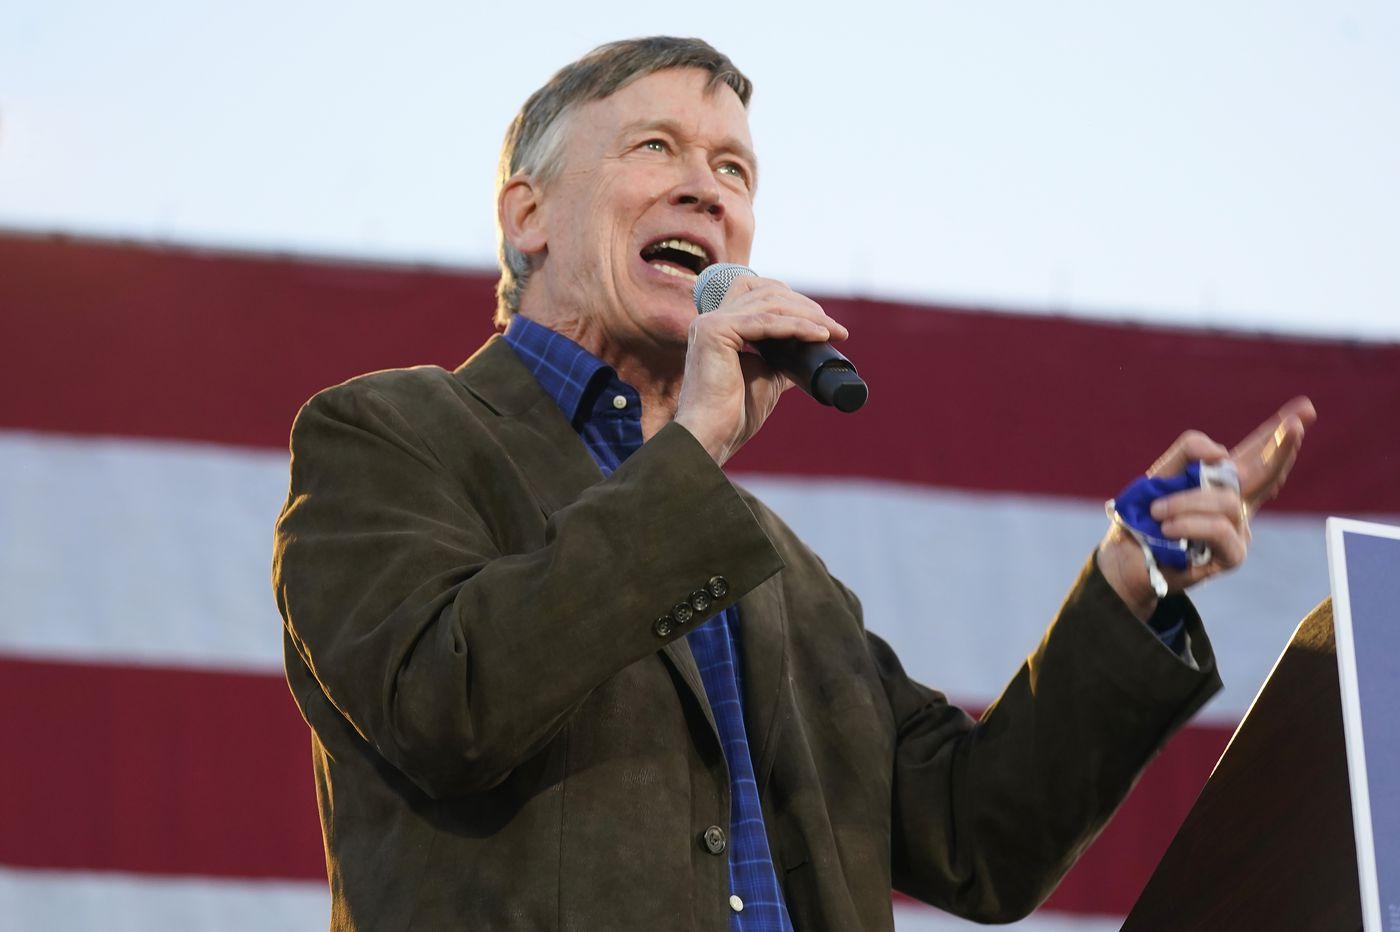 2020 Election: Democrats flip Senate seat in Colorado, move closer to retaking control from Republicans